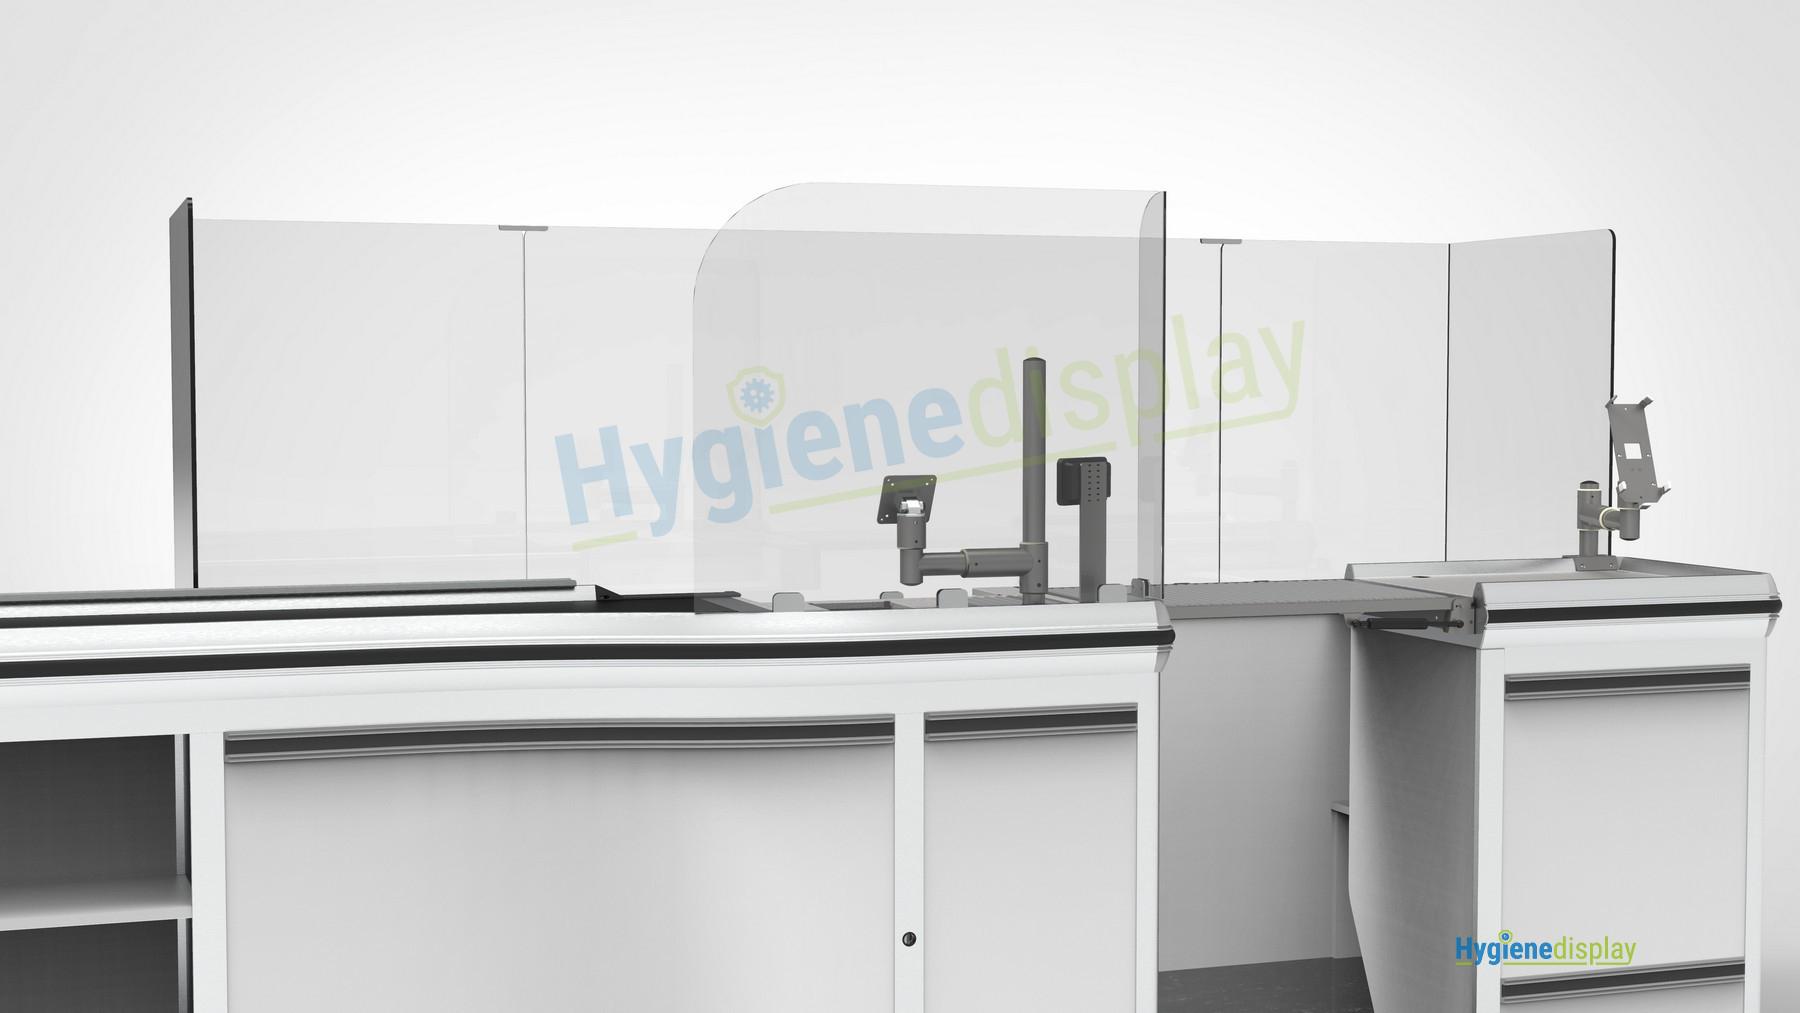 Hygieneschirme